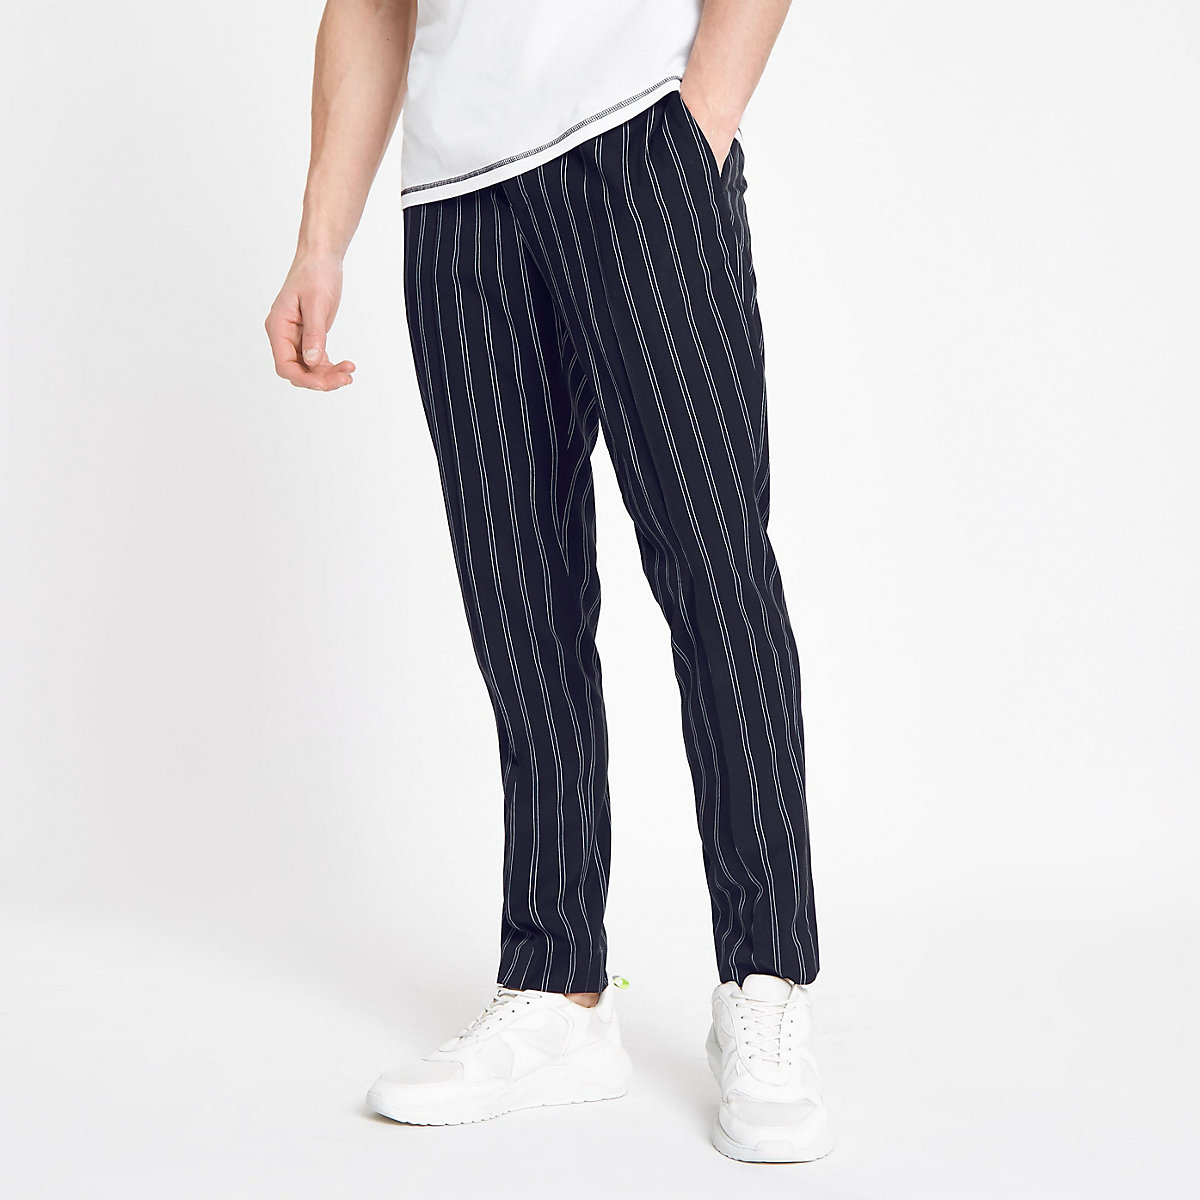 Navy stripe skinny fit jogger pants